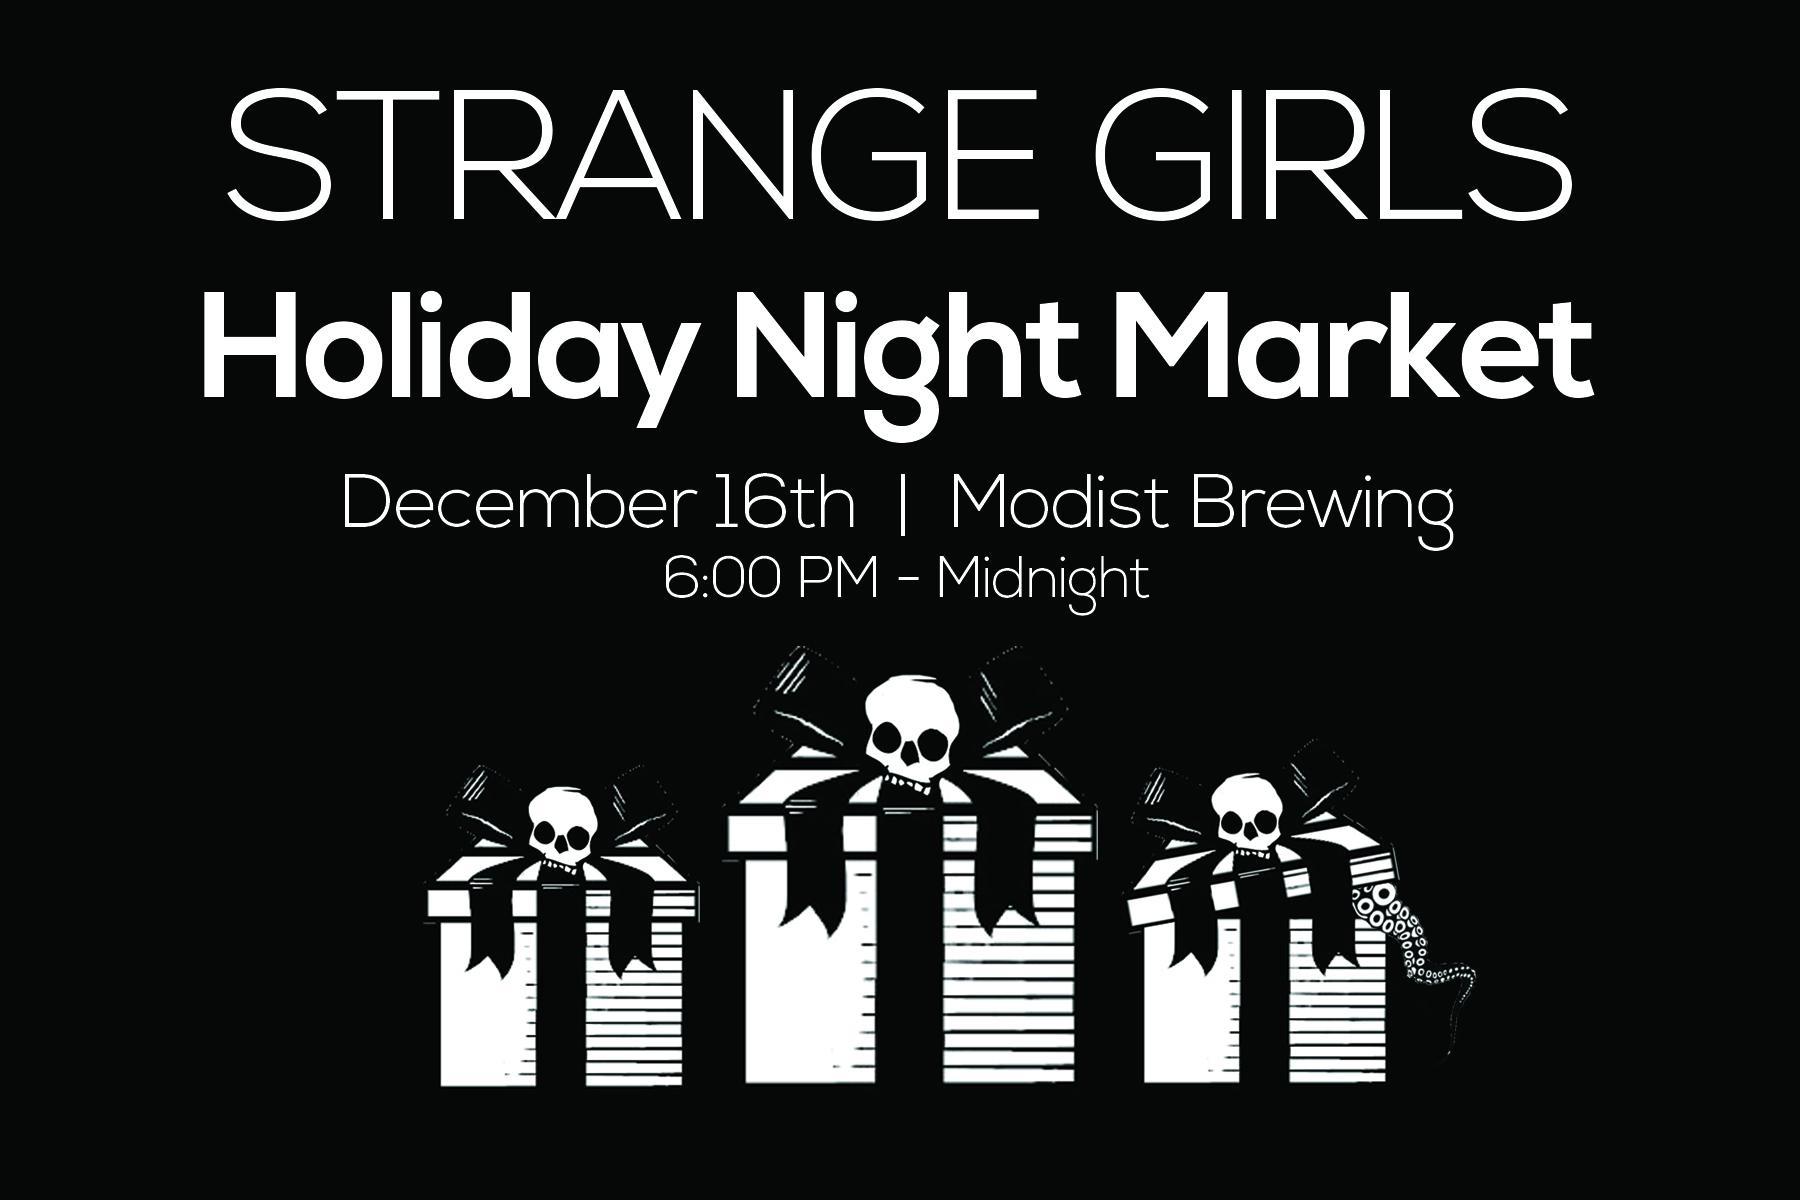 strange-girls-holiday-night-market